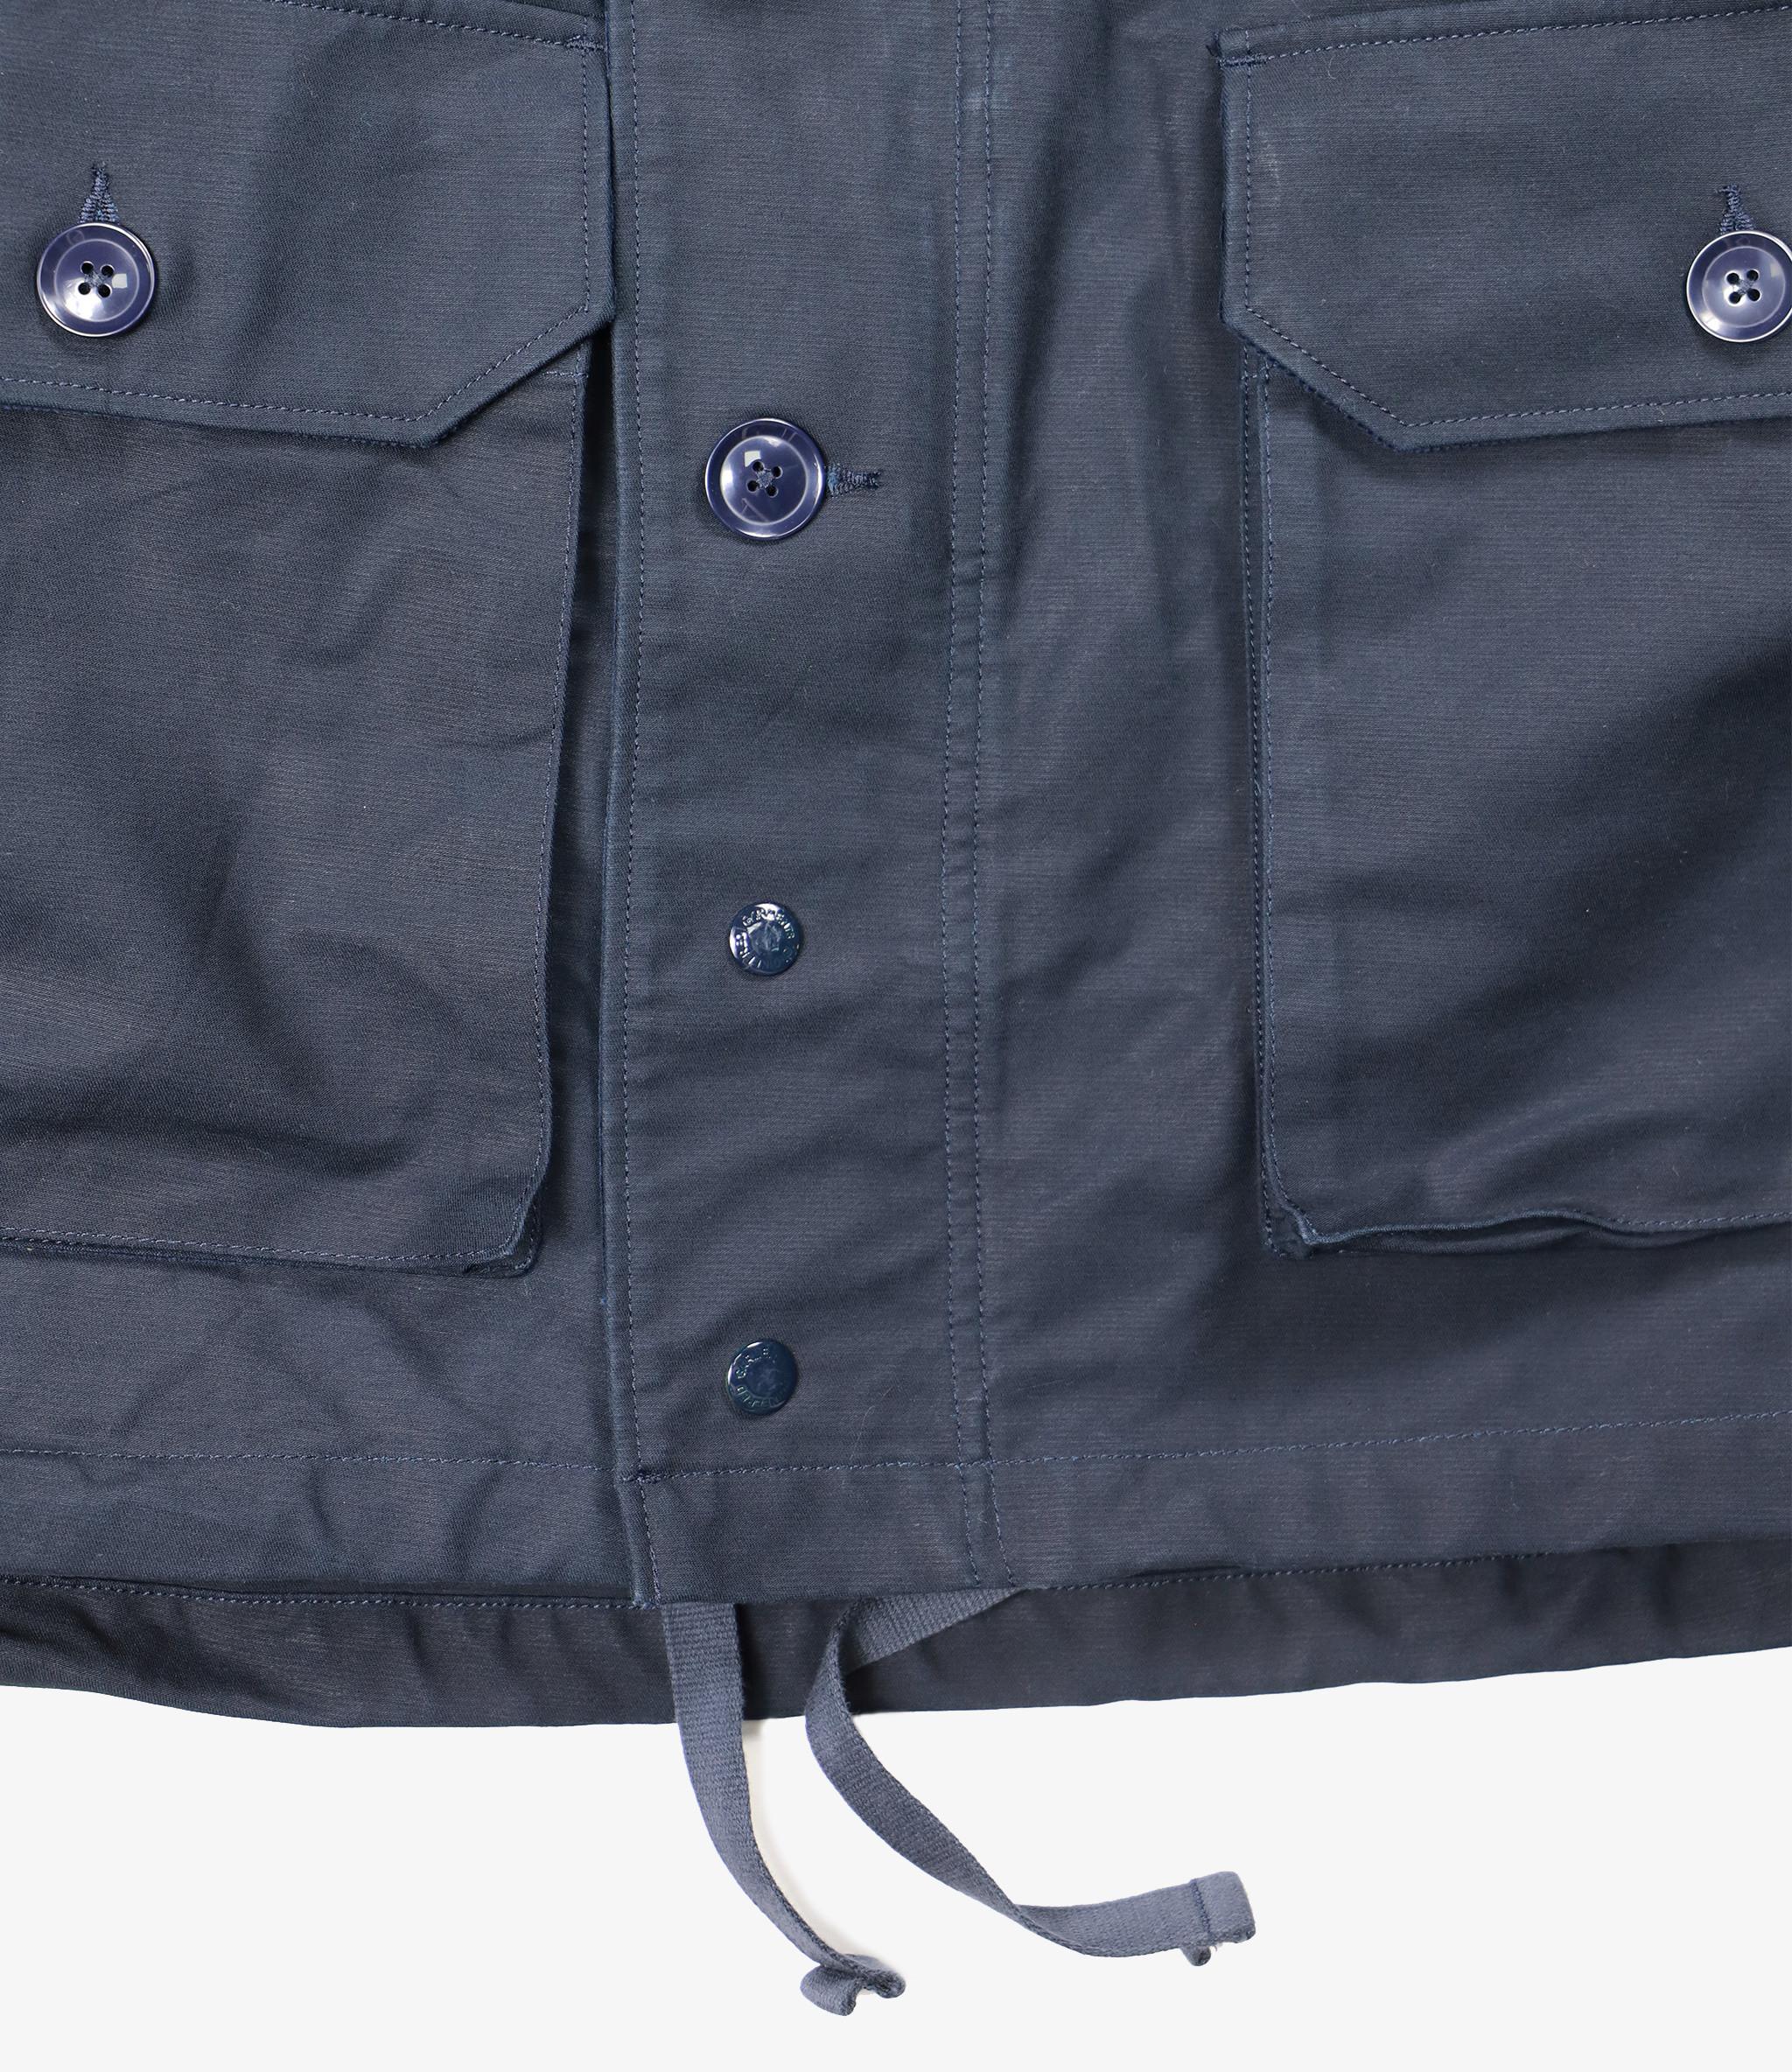 Engineered Garments Field Parka - Navy Cotton Double Cloth